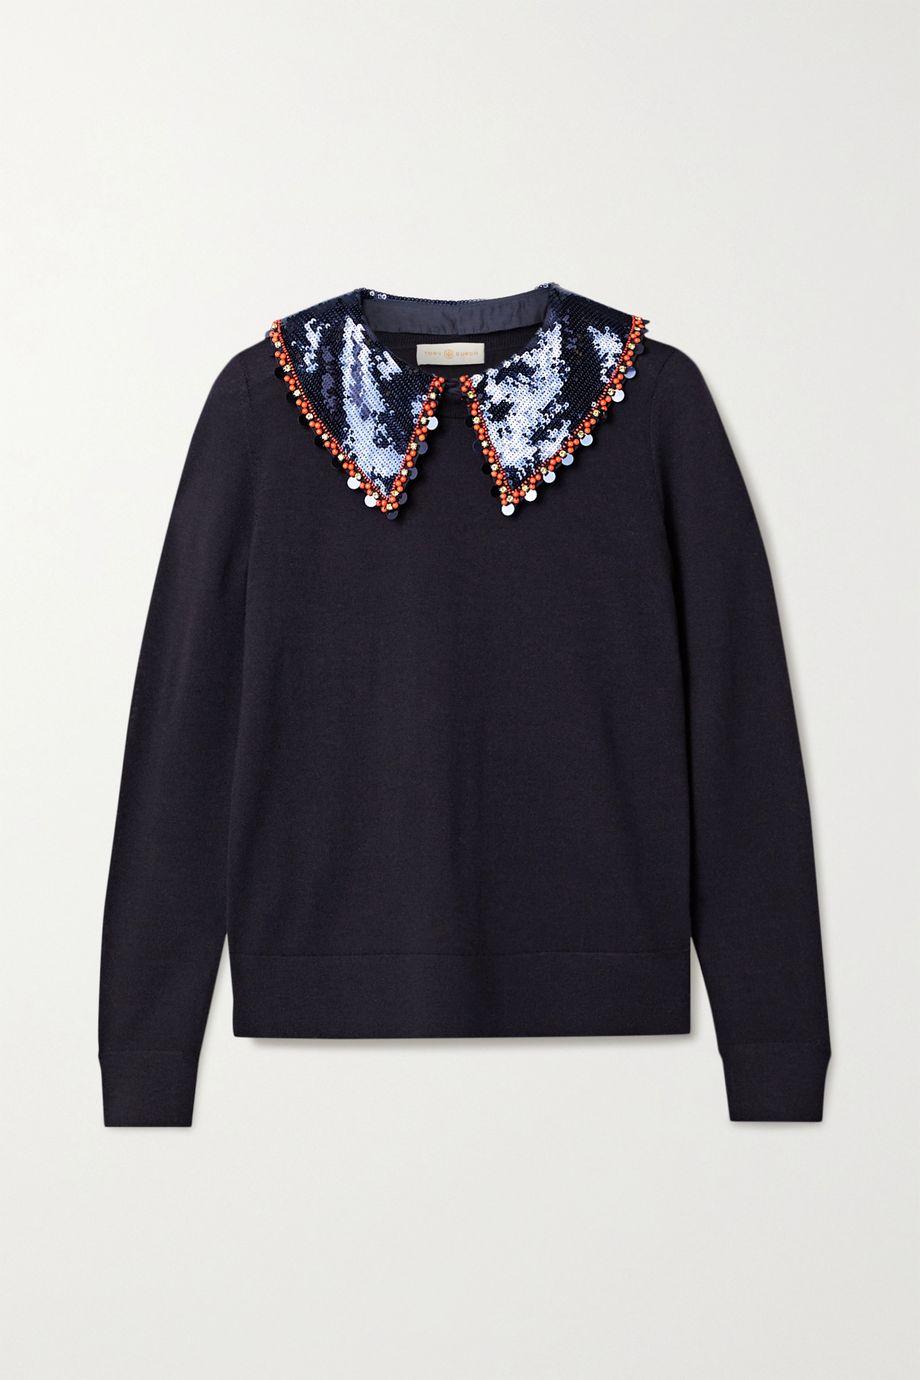 Tory Burch Convertible embellished merino wool sweater